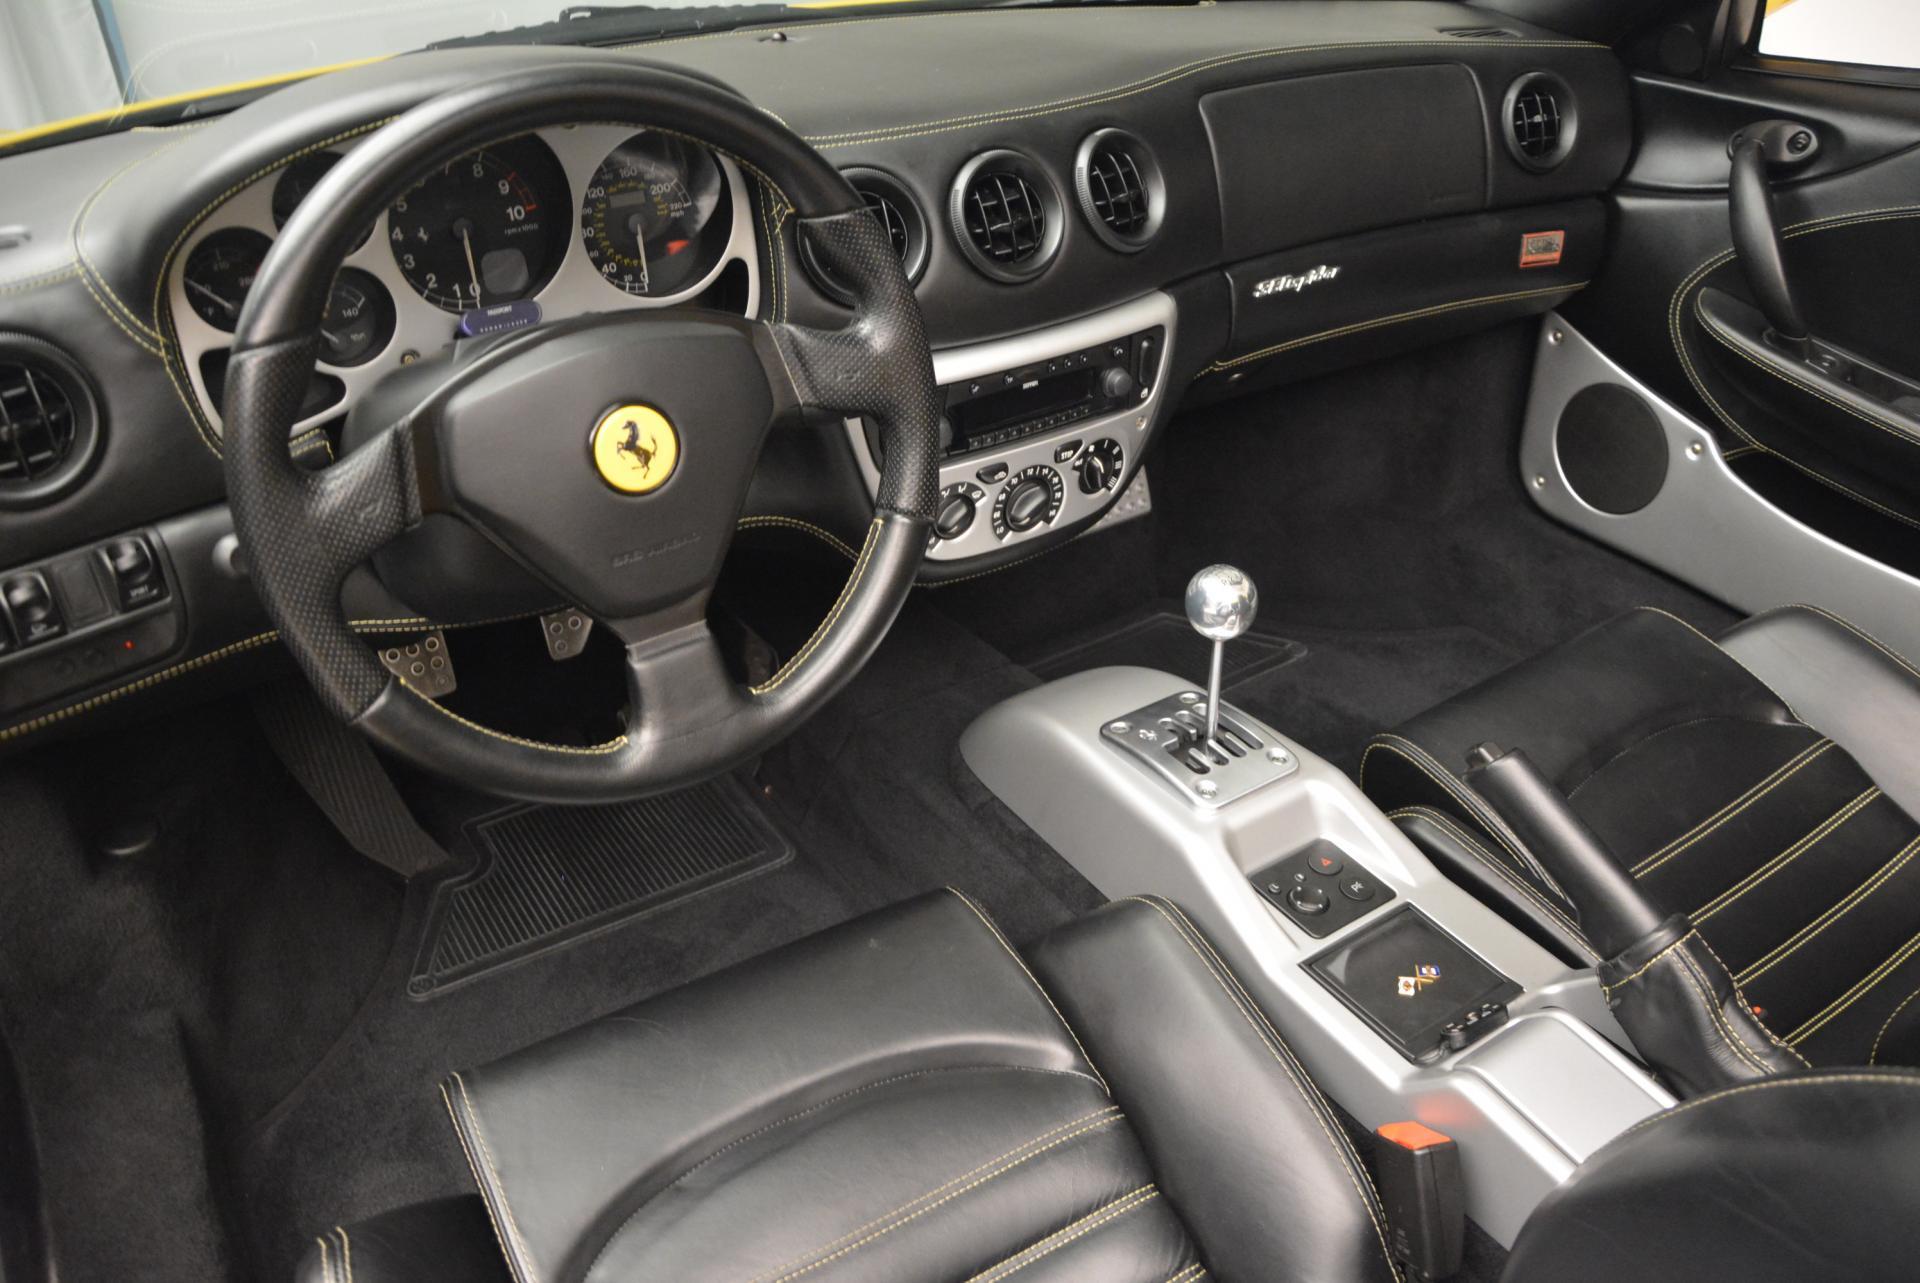 Used 2003 Ferrari 360 Spider 6-Speed Manual  For Sale In Greenwich, CT. Alfa Romeo of Greenwich, 4239A 127_p25